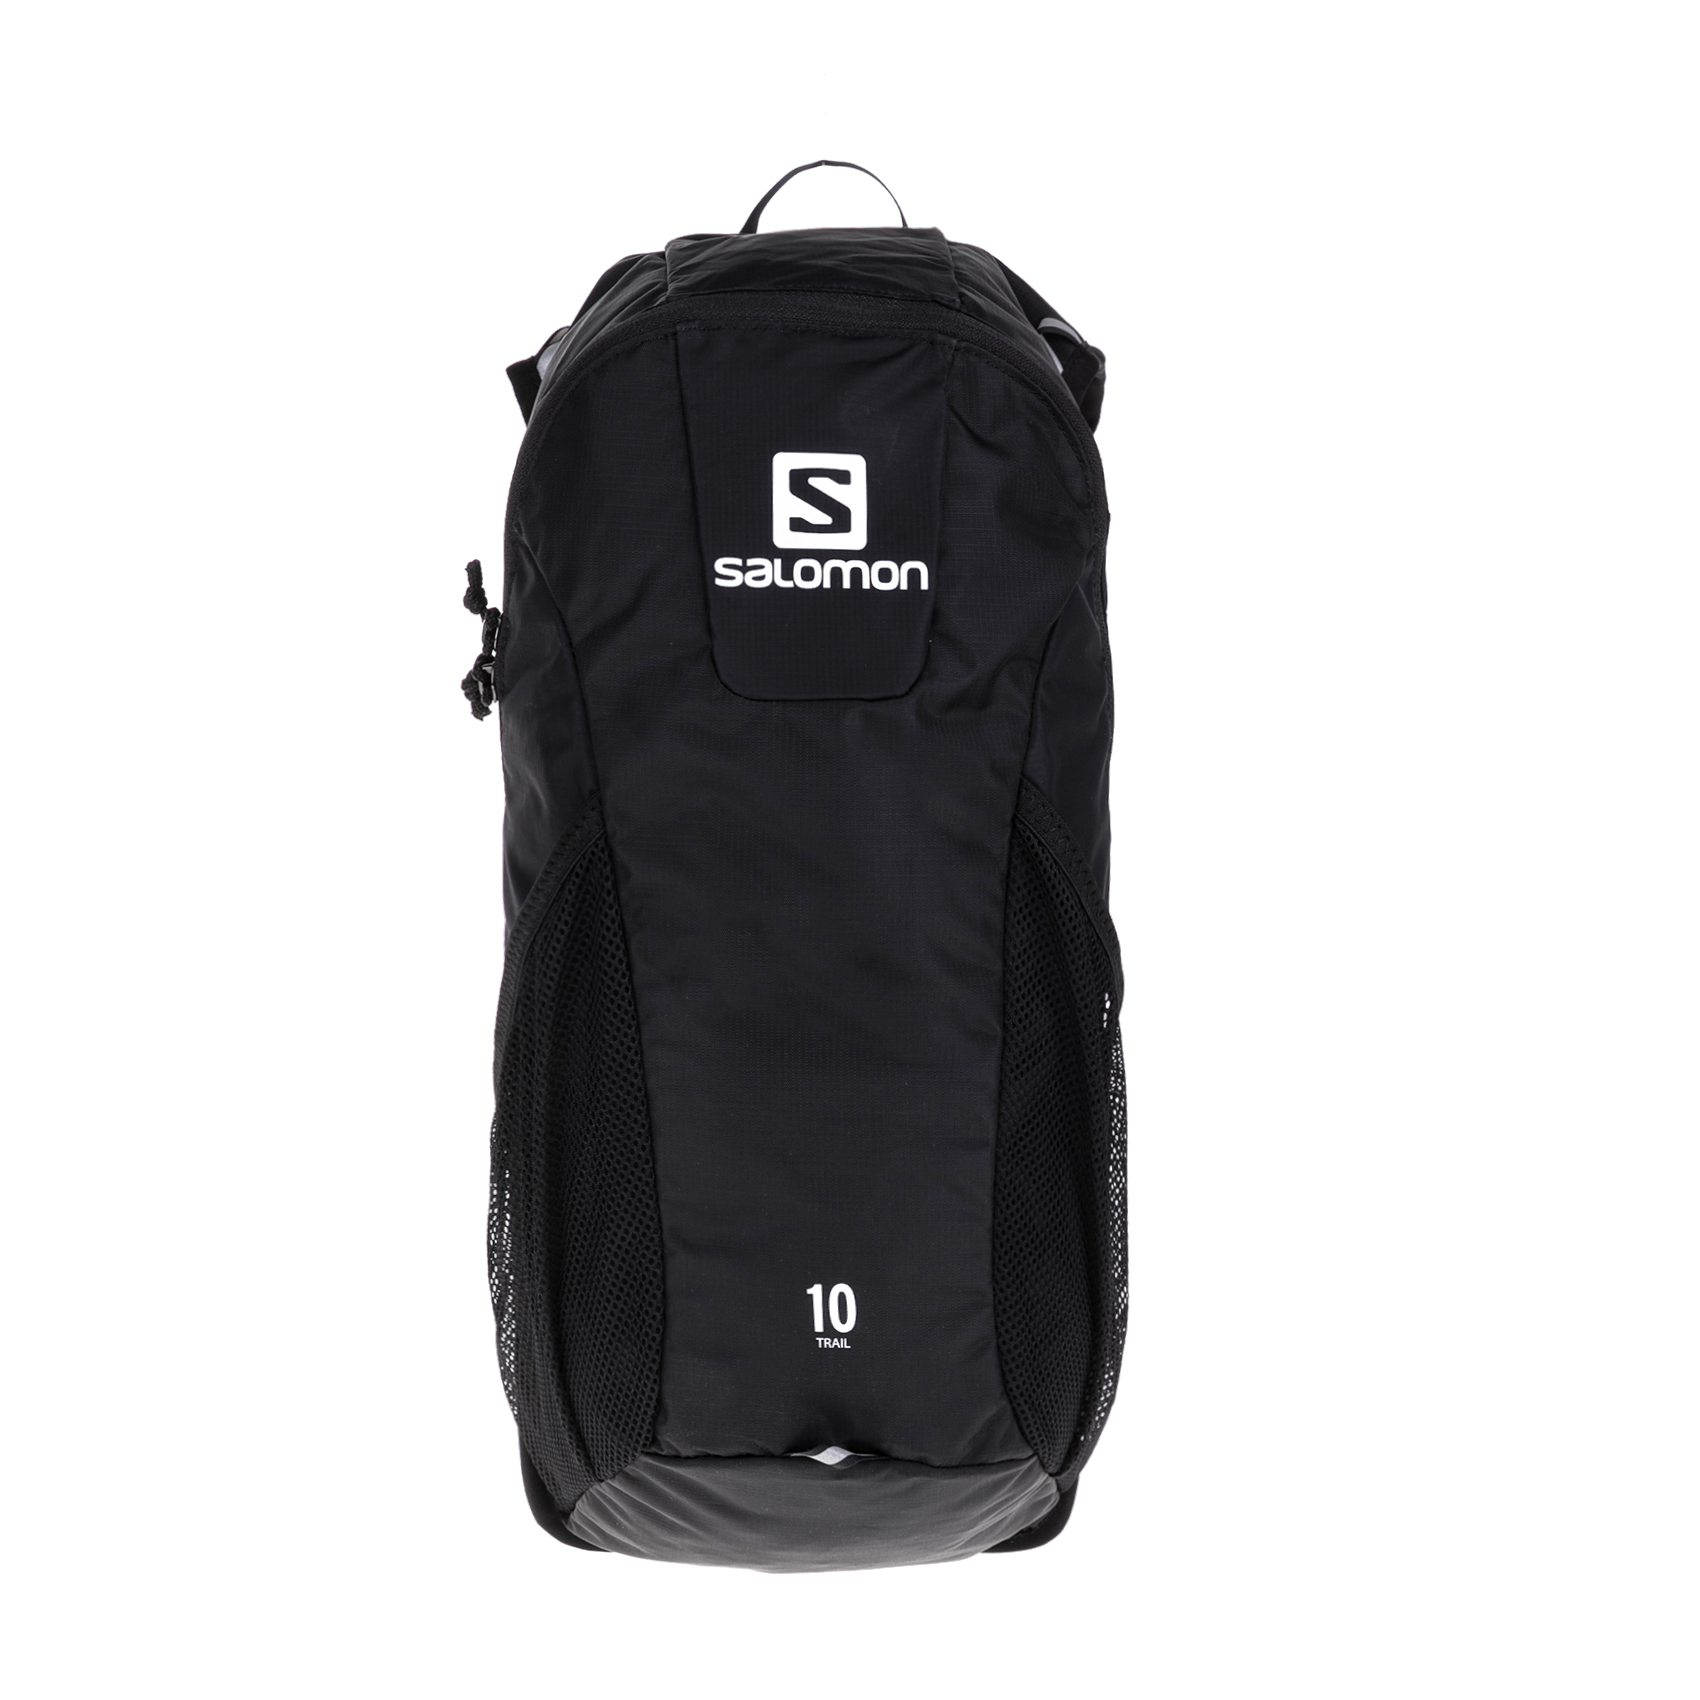 SALOMON – Σακίδιο πλάτης SALOMON PACKS BAG TRAIL 10 μαύρο